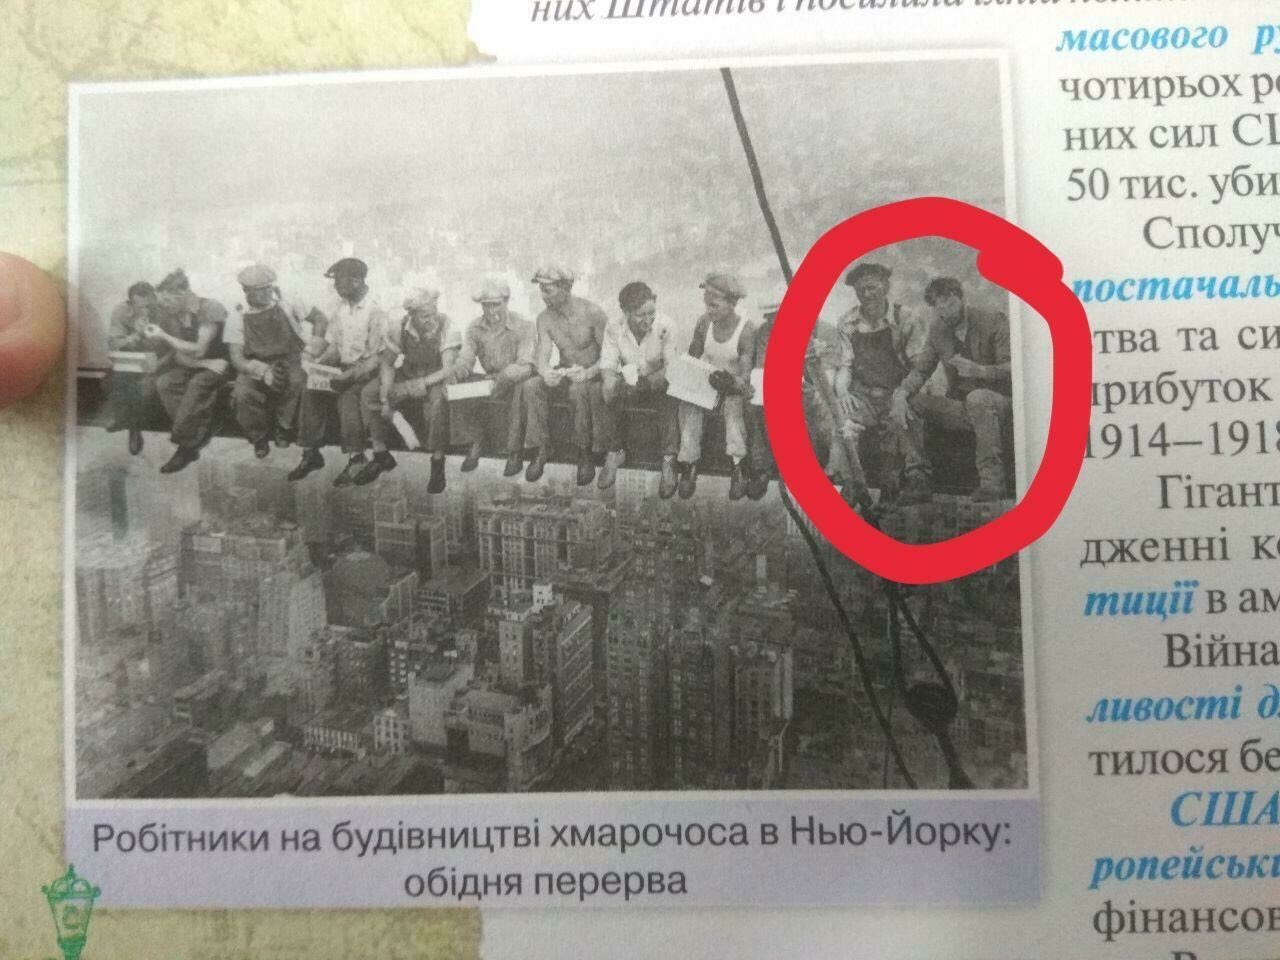 Keanu_Reeves_Ukrainian_history_textbook.